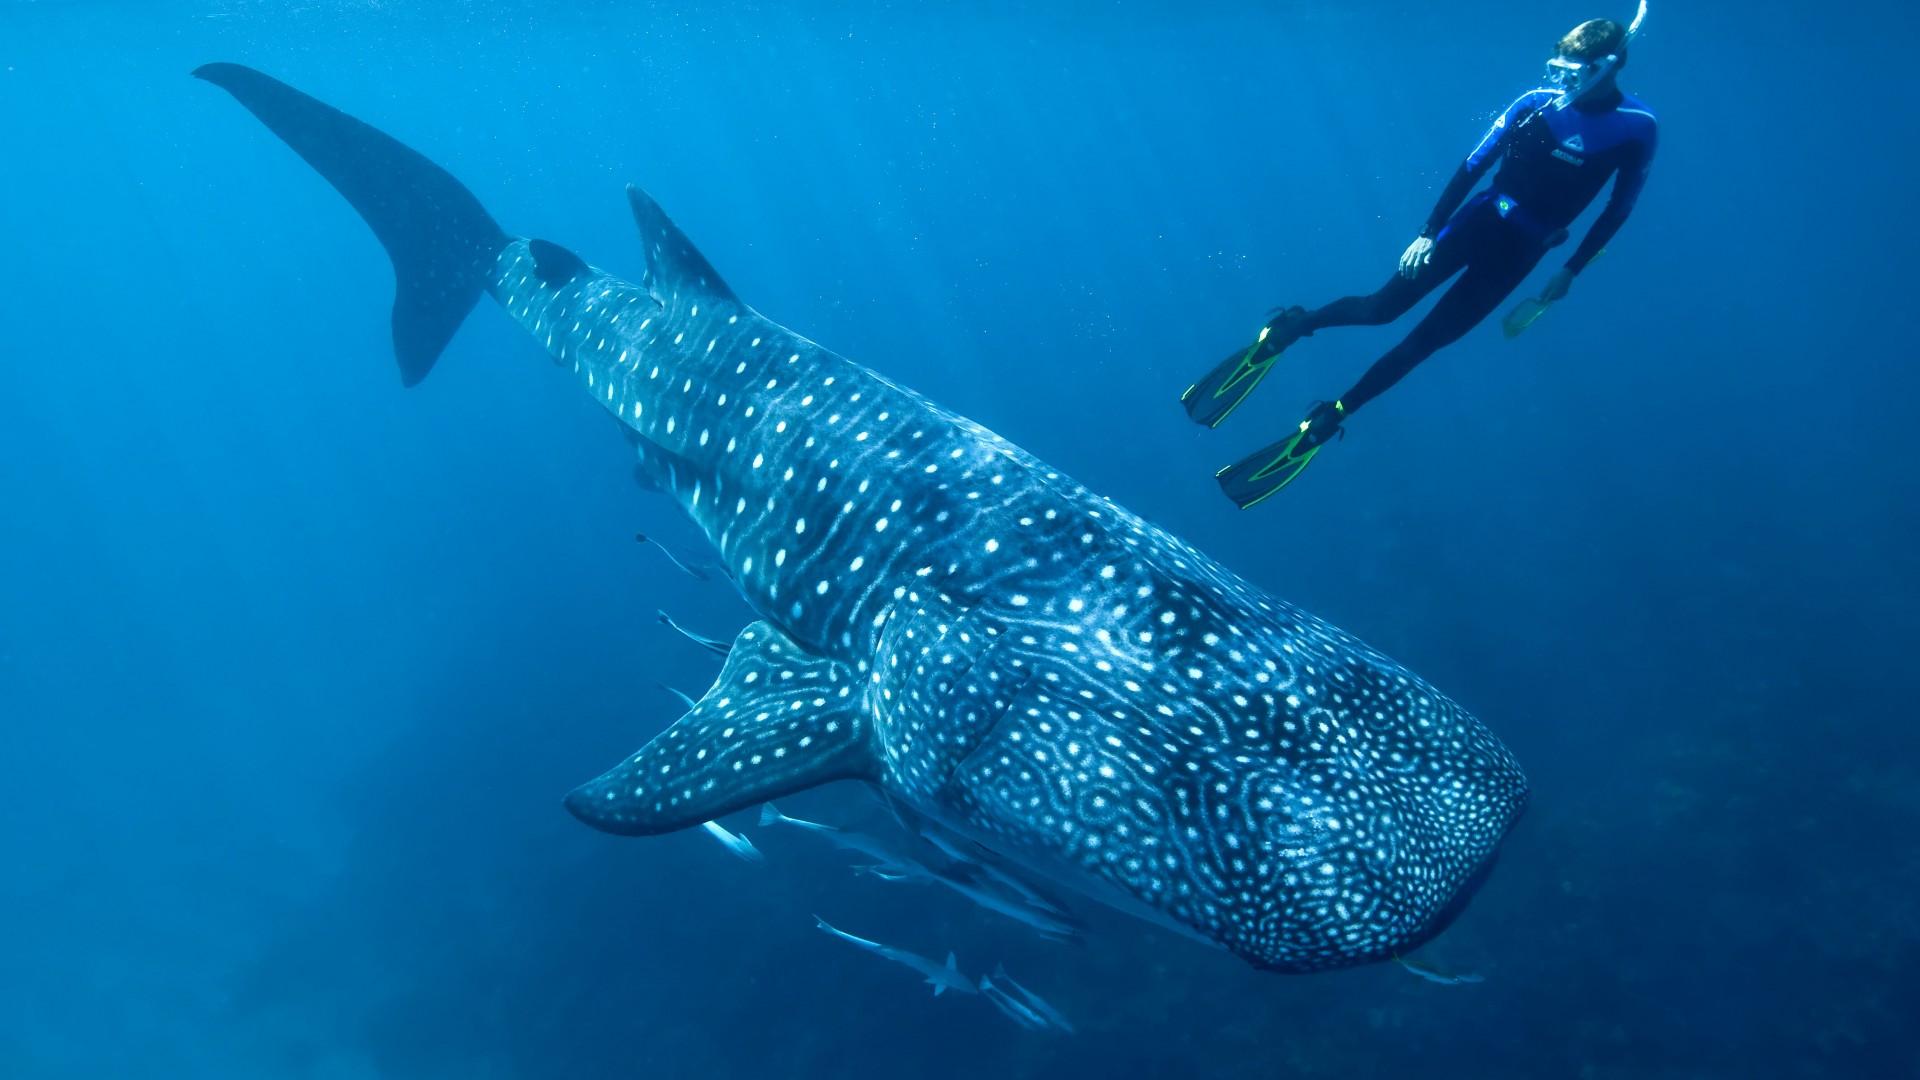 ... pacific, ocean, water, underwater, blue, diving, tourism, fish, World Pacific Ocean Water